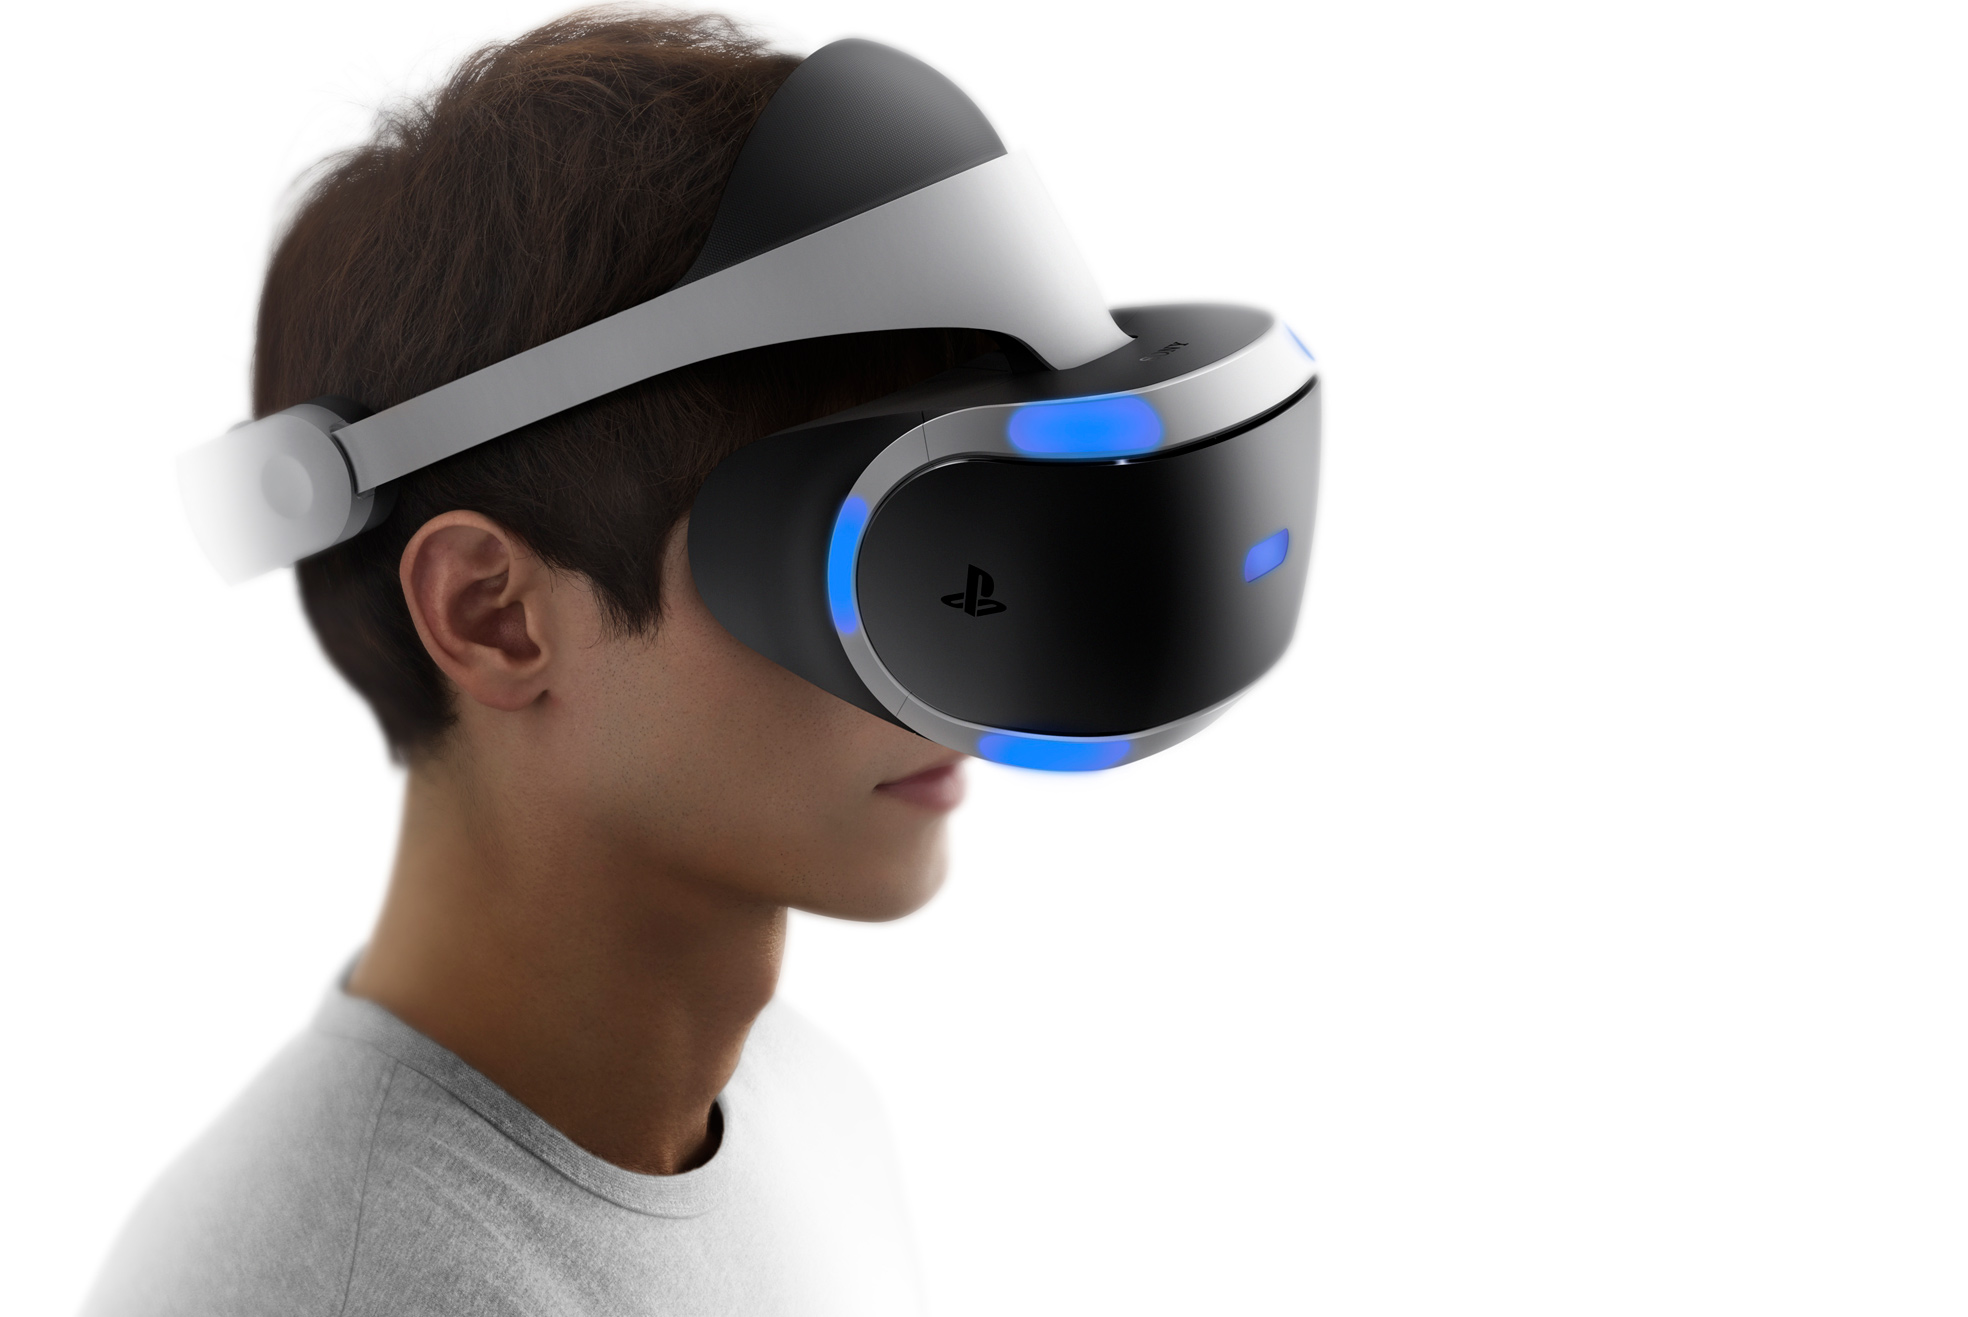 casque virtuel sony sortie